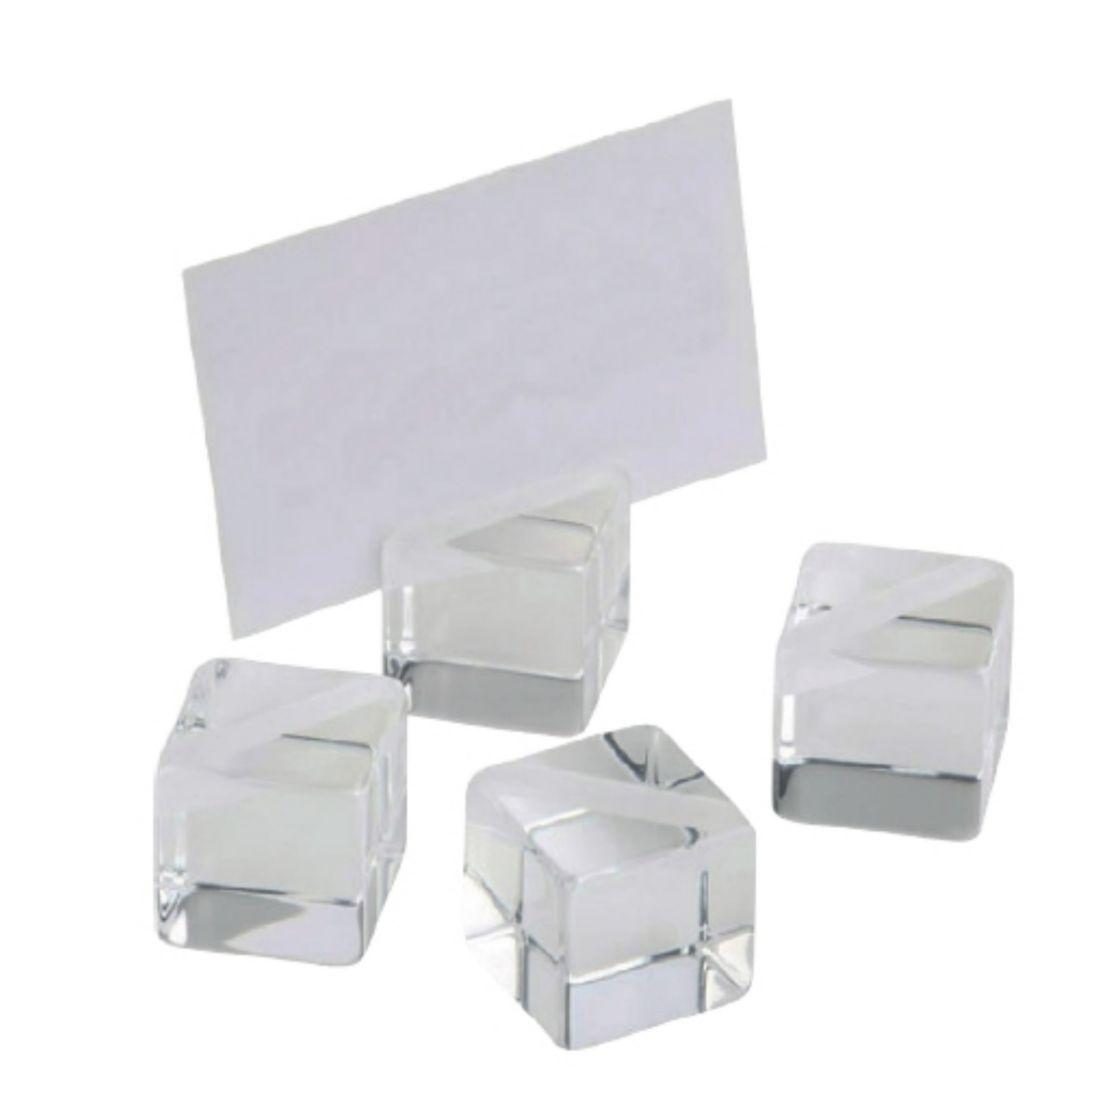 Sestava tabulek informačních, 4x akrylový stojan, 20x bílé karty